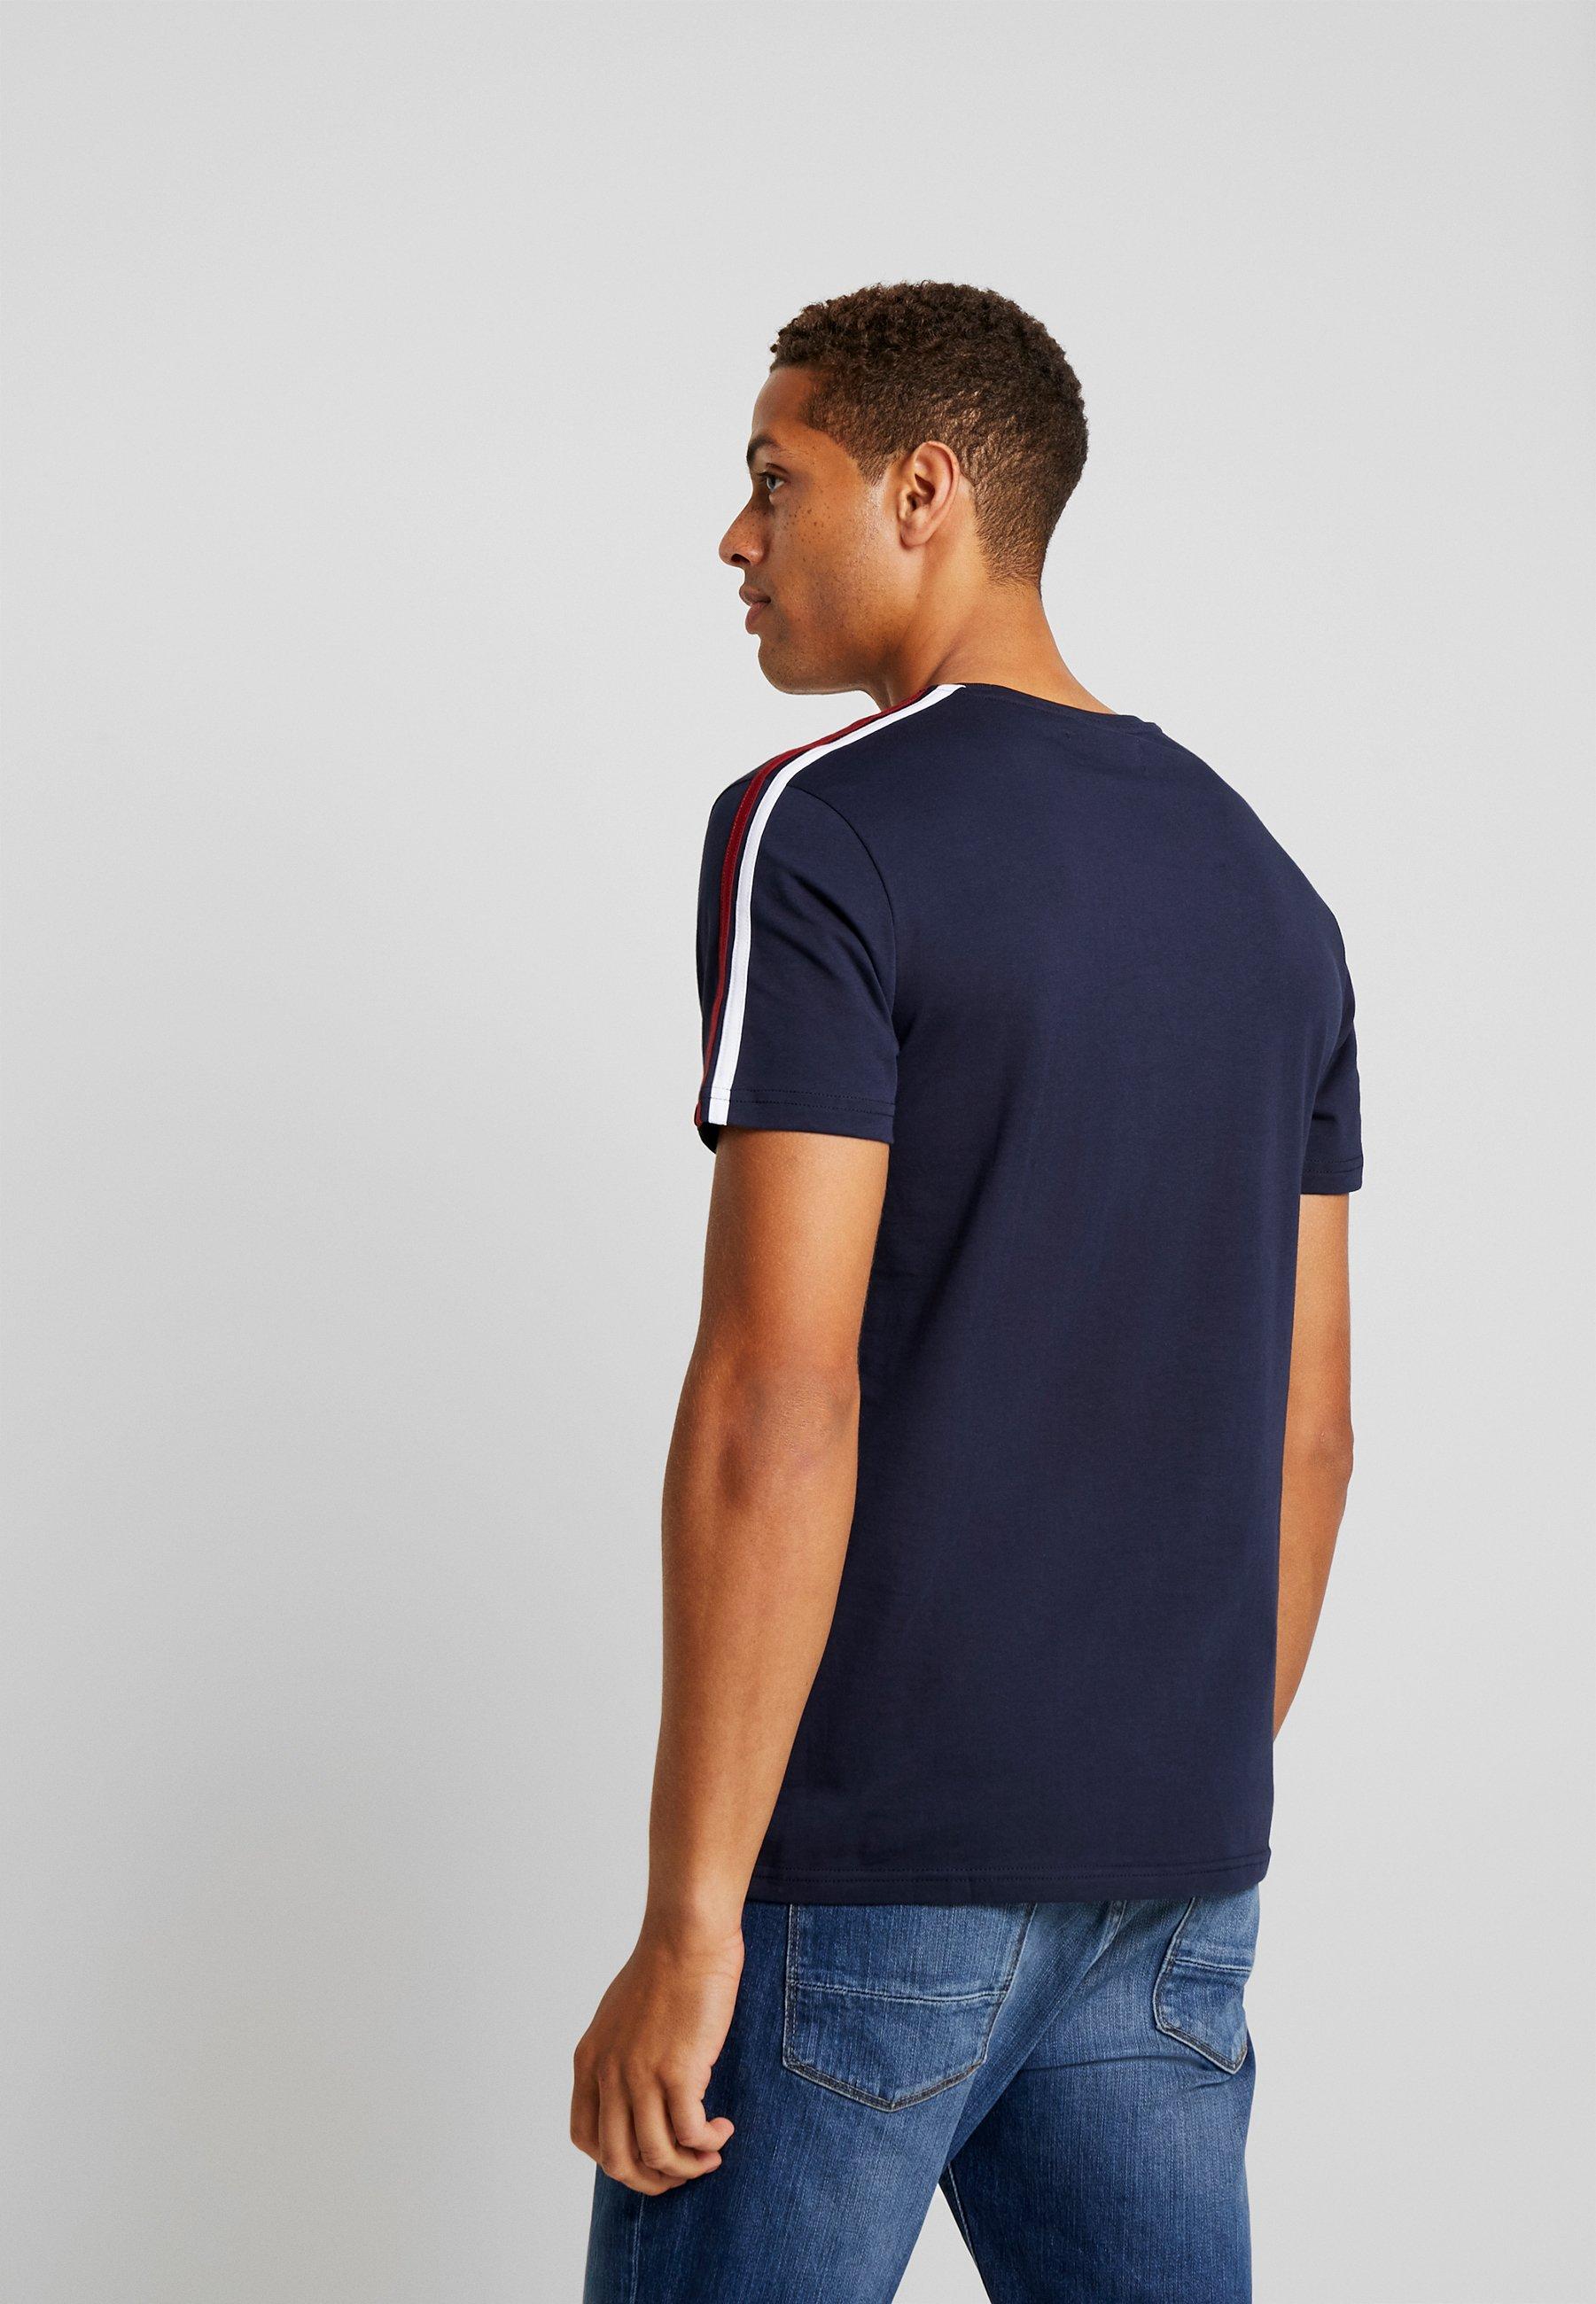 Blue Pier T shirt ImpriméDark One kiuXPZ